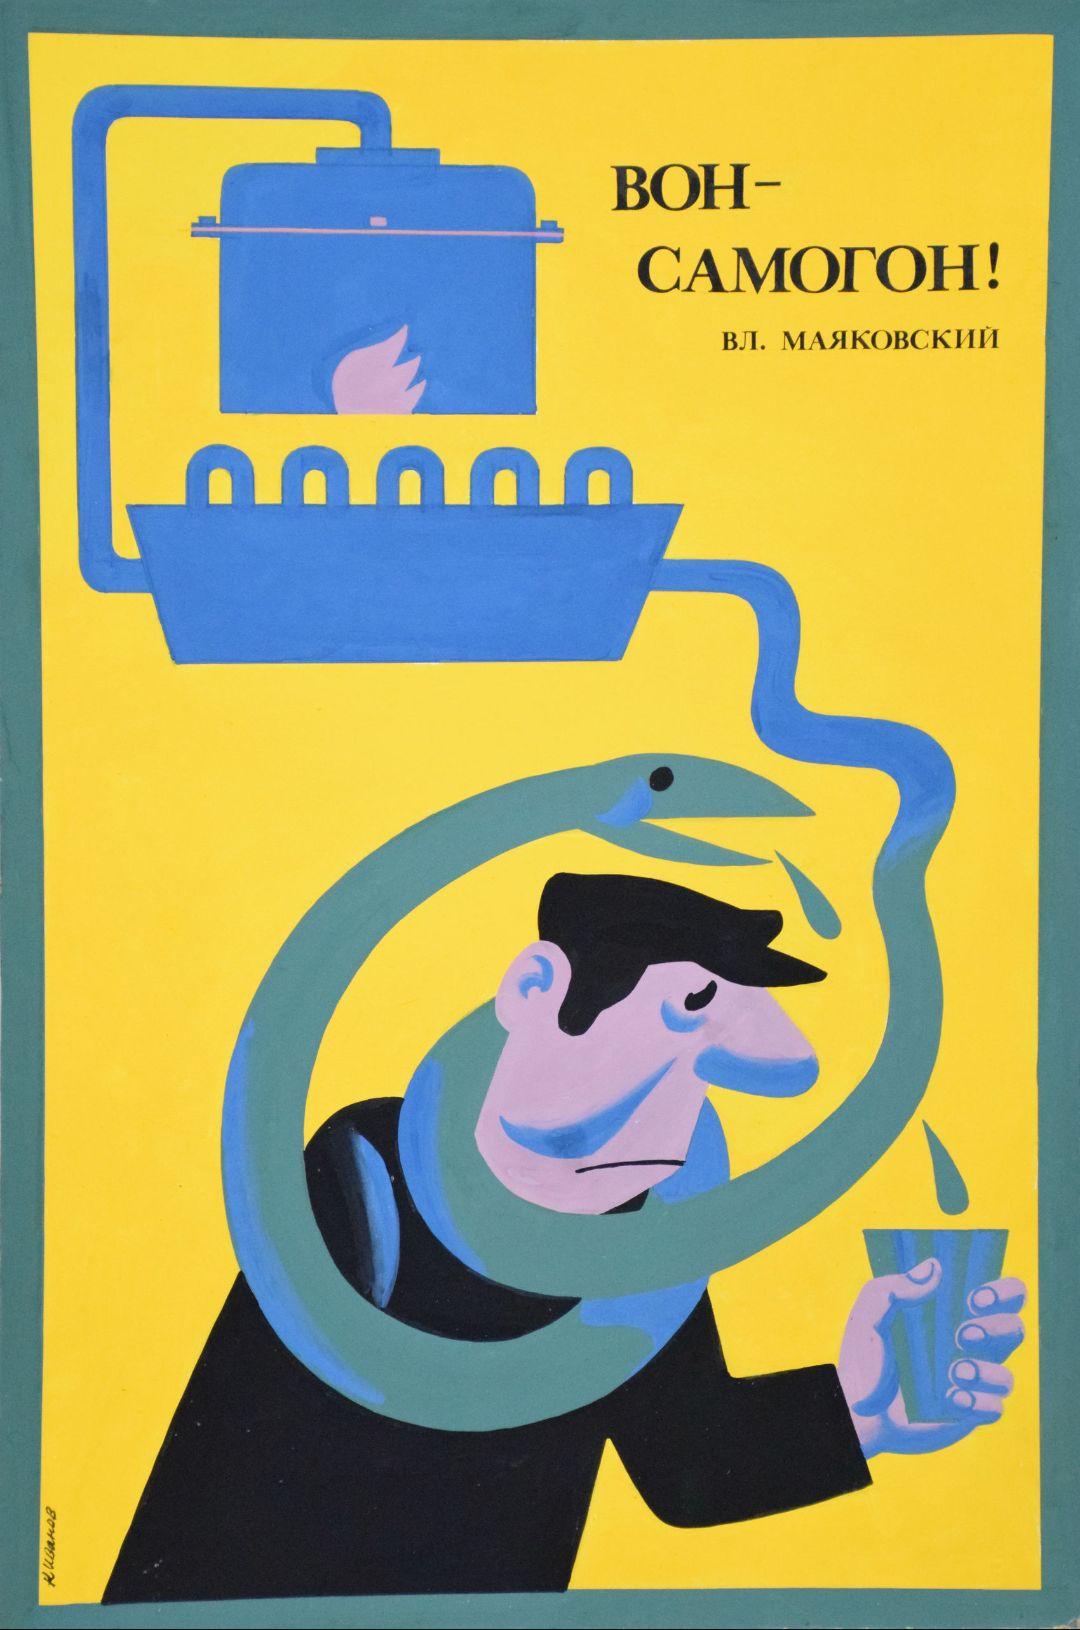 Плакат. Вон — самогон! Автор: О. А. Зайнова. 1988 г.